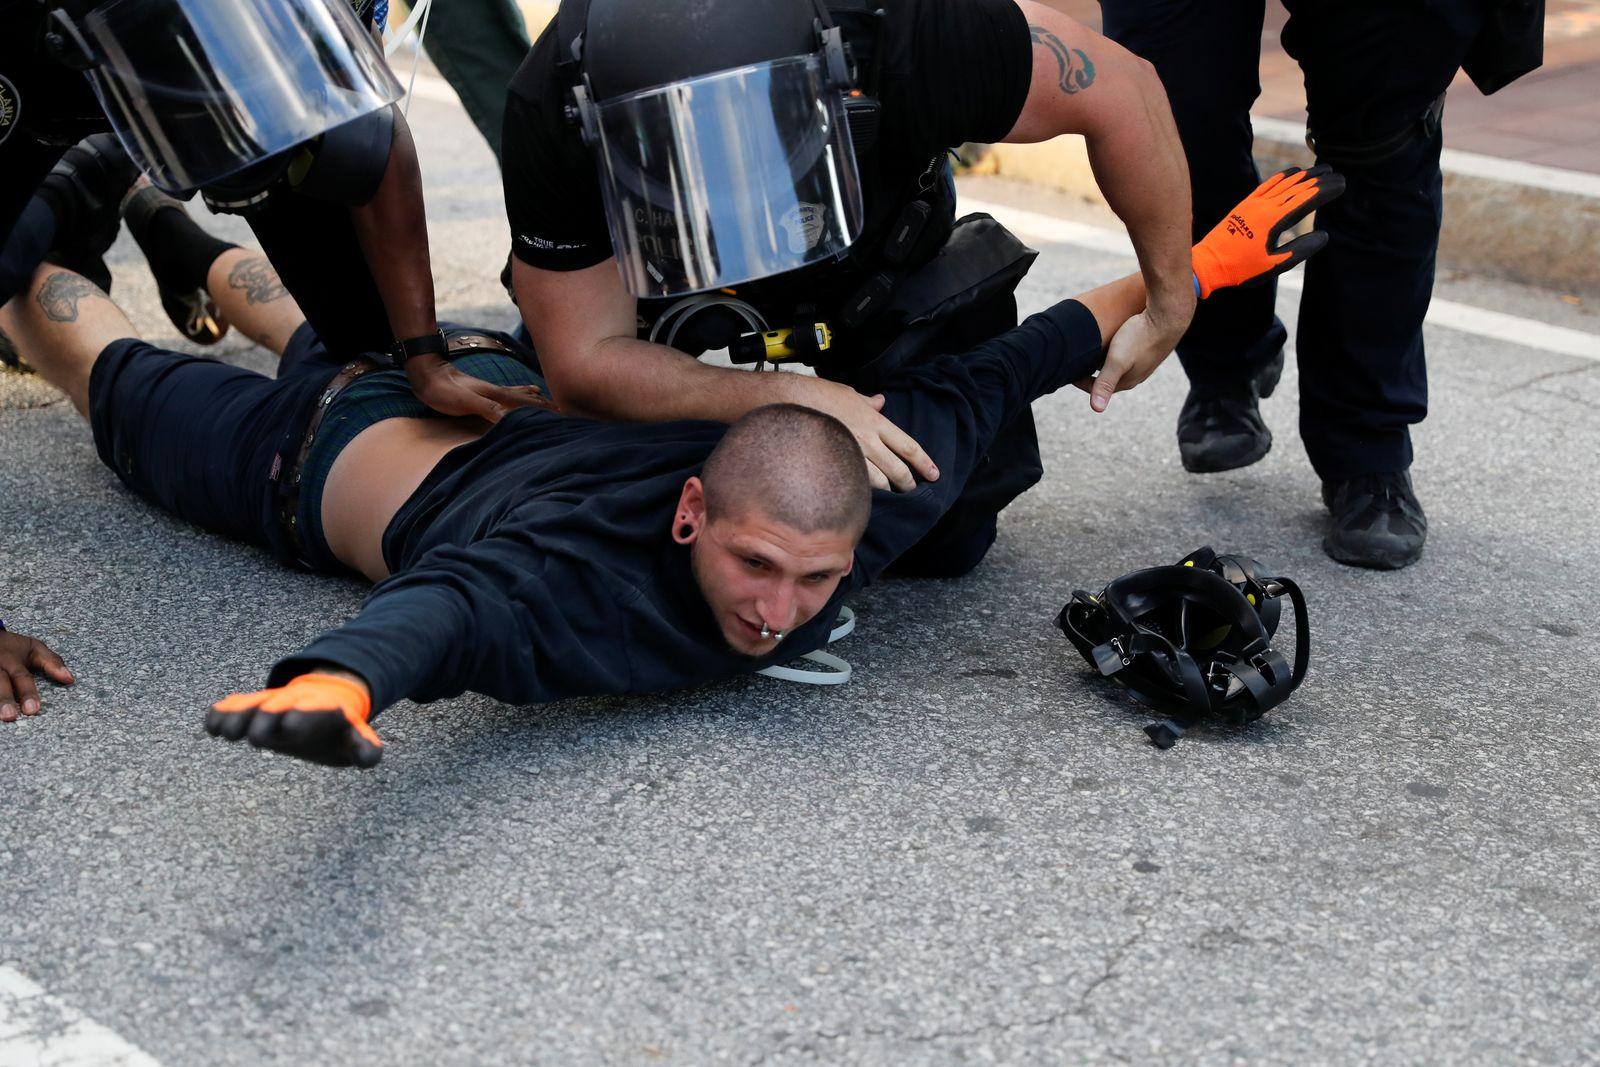 Protest against the death in Minneapolis police custody of George Floyd, in Atlanta